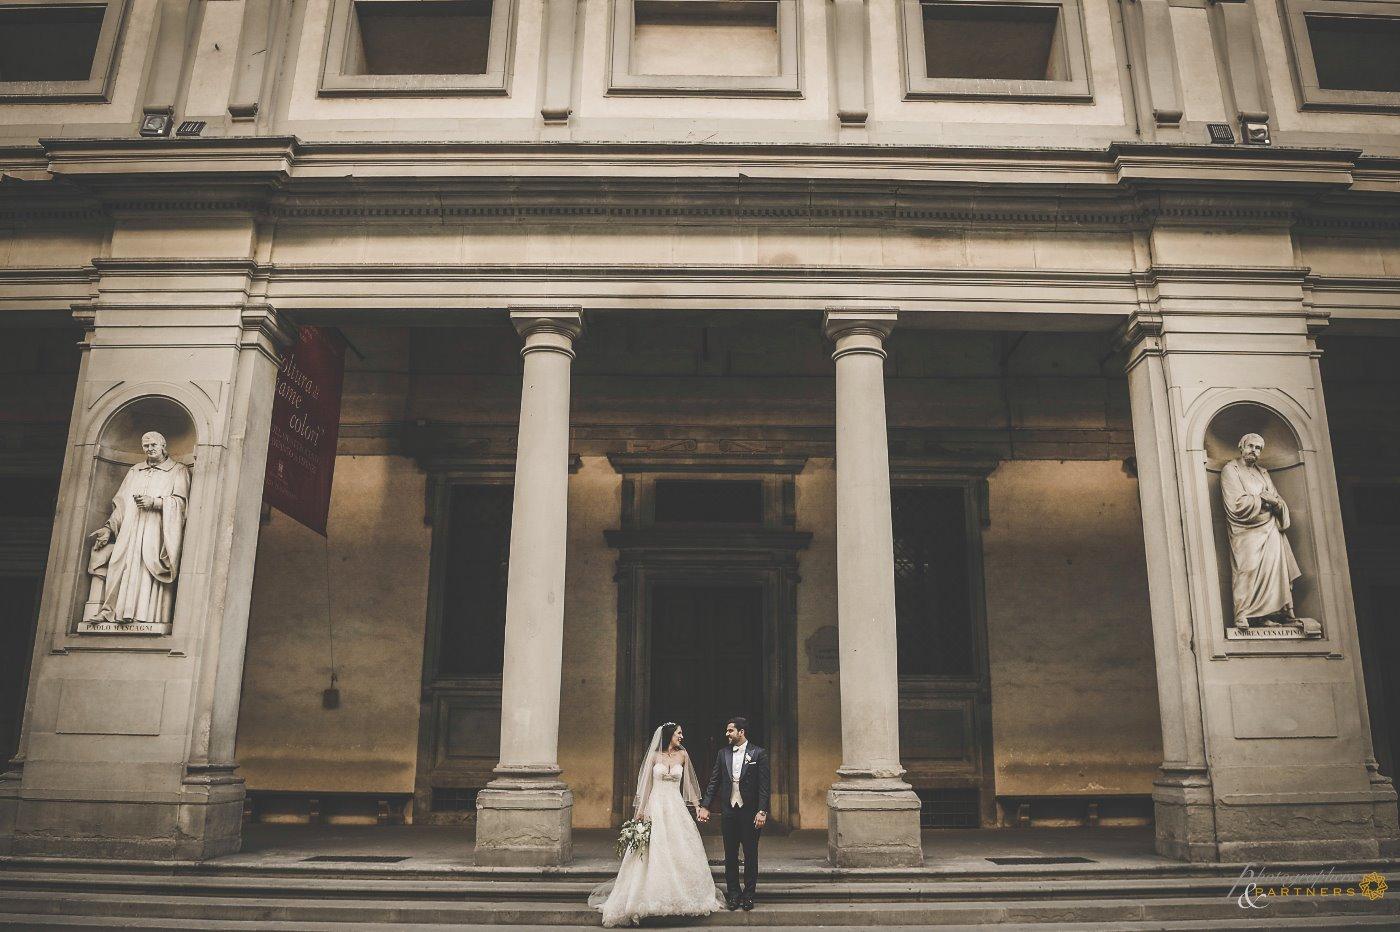 photography_weddings_florence_12.jpg